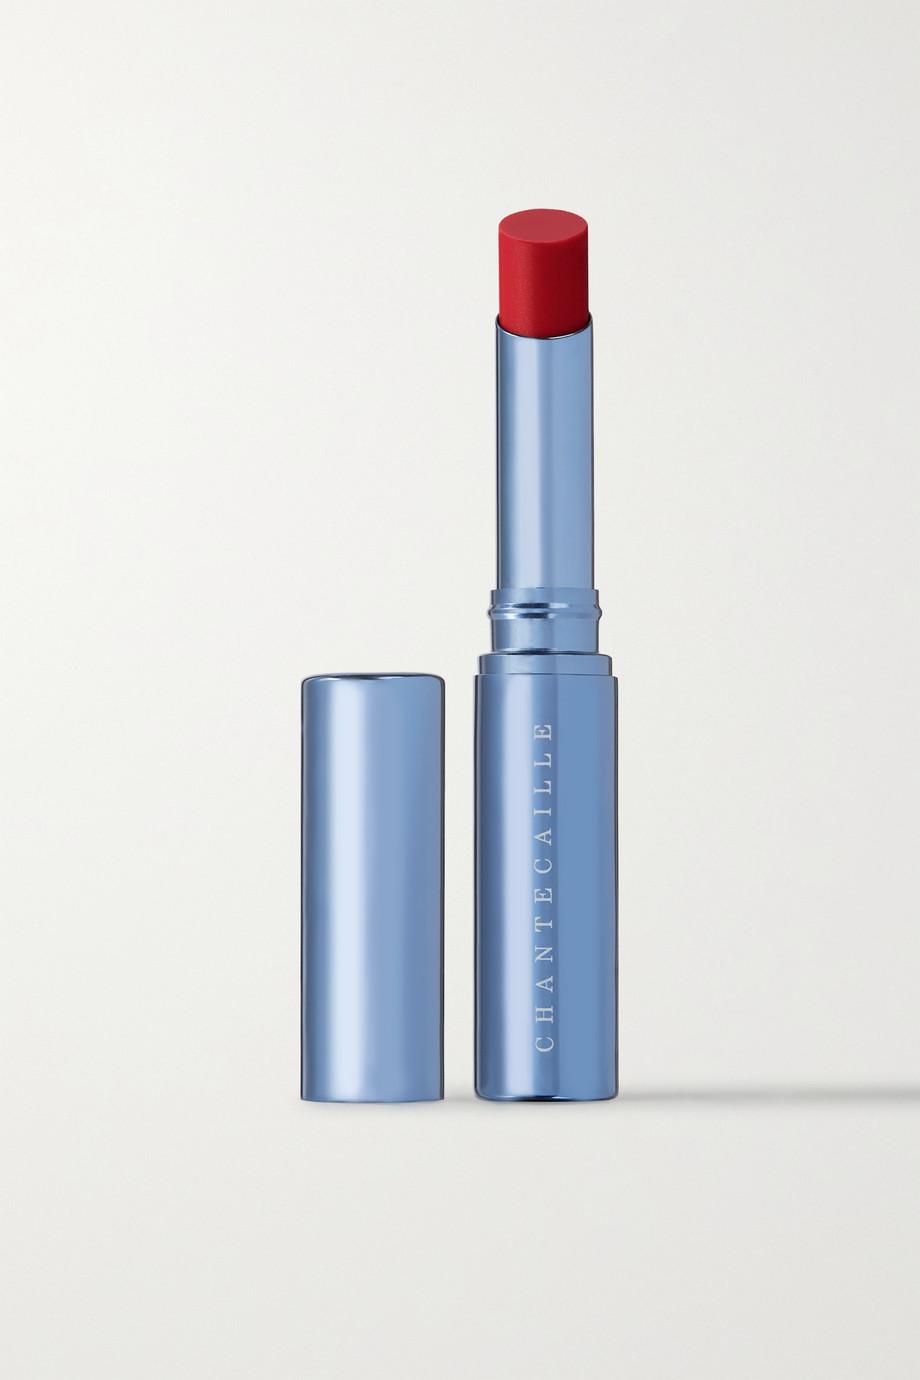 Chantecaille Lip Tint Hydrating Balm - Madeira